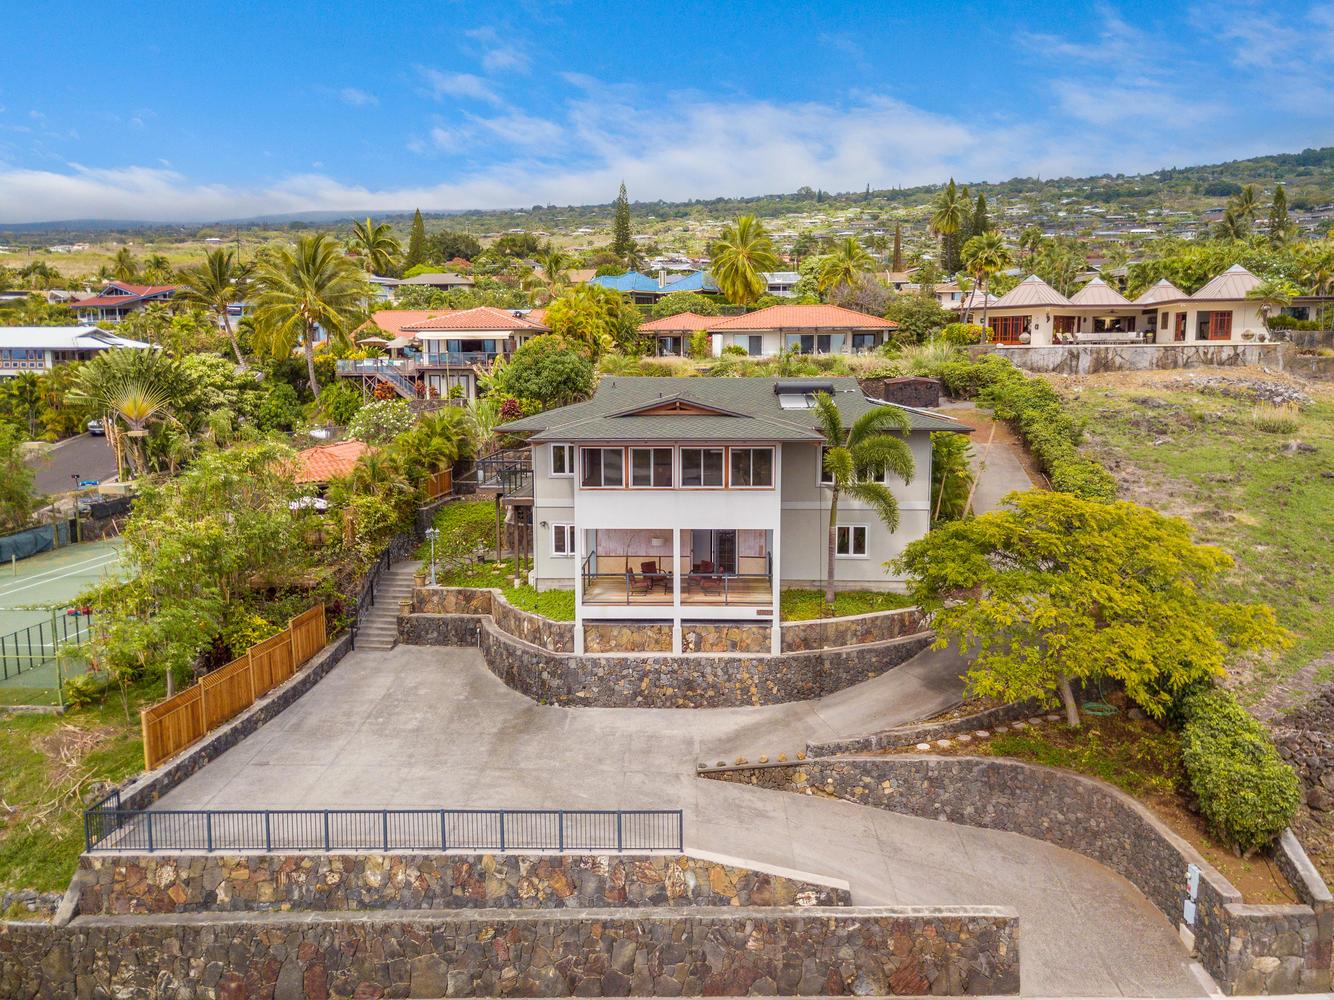 Komohana Kai 2 |   $859,900 | 4BR / 3 BA | 2,916 interior | 15,002 sq. ft. land |    MLS #627605